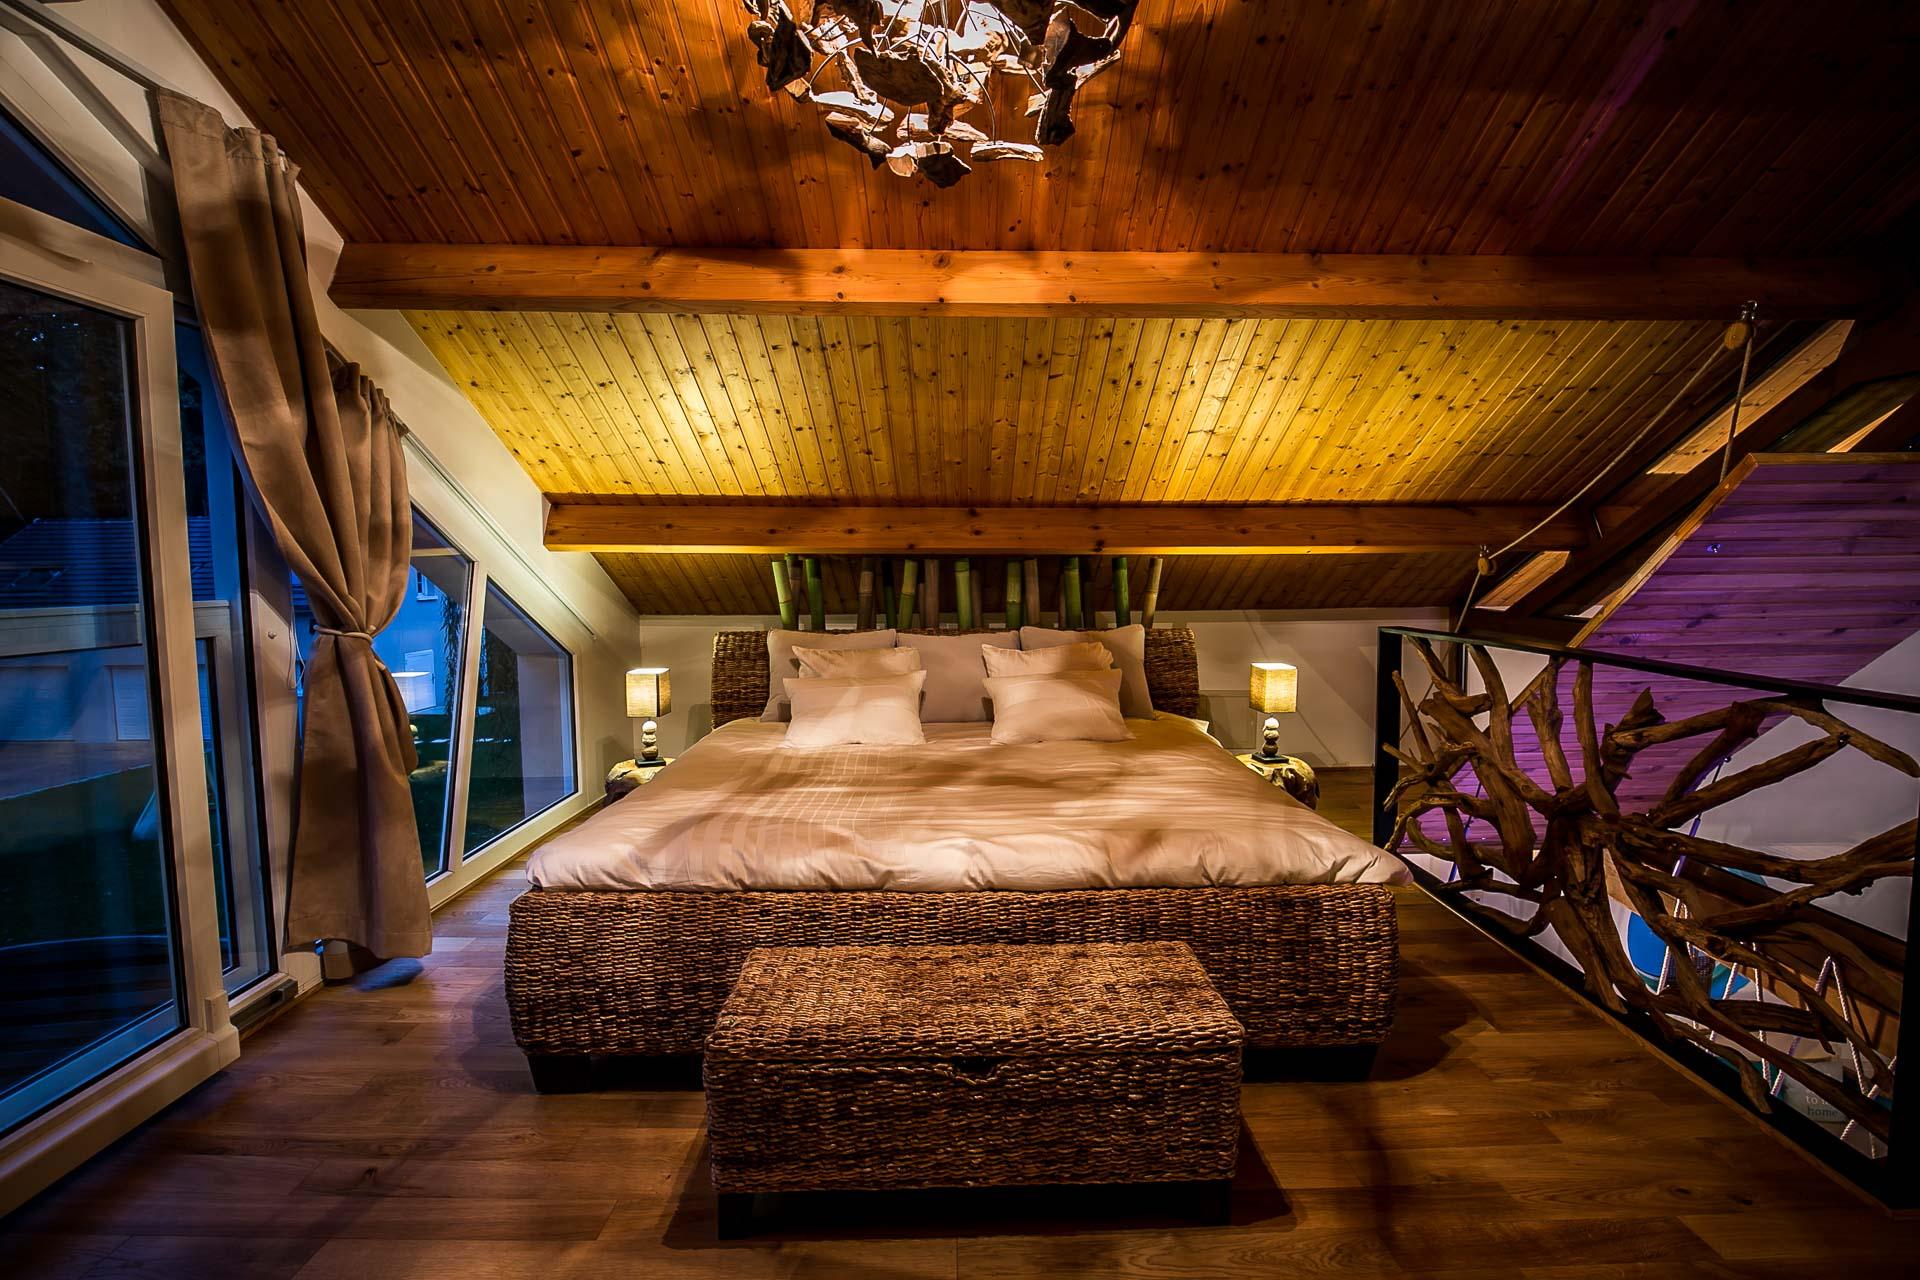 La chambre escale tahiti - Chambre des notaires val d oise ...